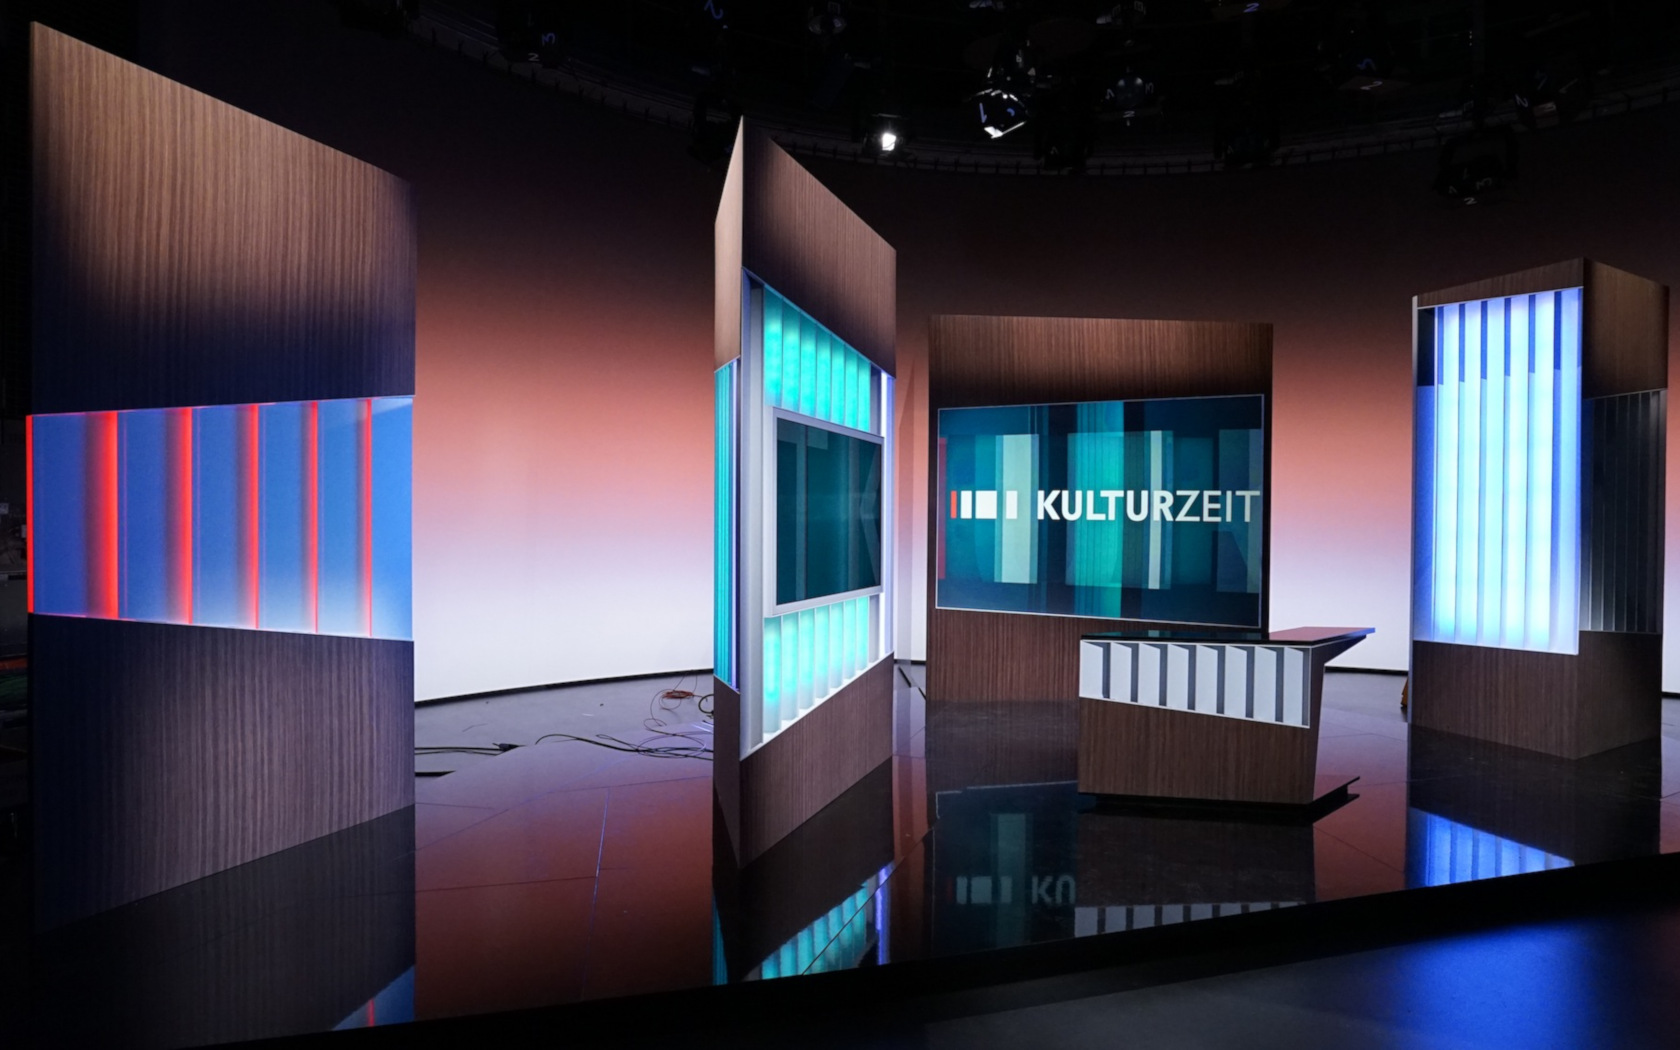 3sat Studios, Kulturzeit, Scobel, Nano, Boris Banozic, TV Studios, Illusion, Wissenschaft und Kultur nachrichten